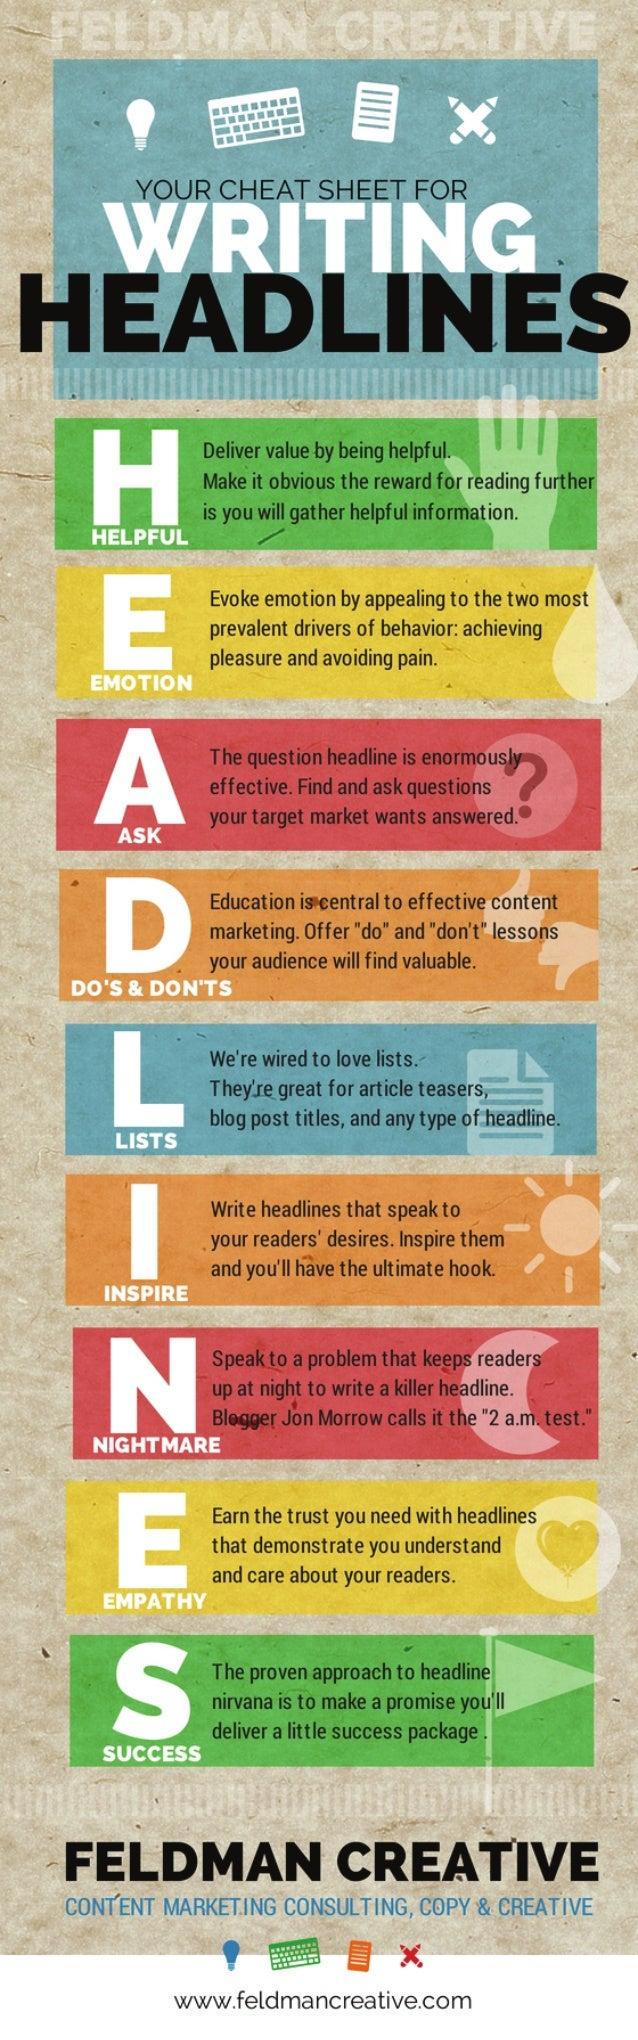 Writing Headlines infographic